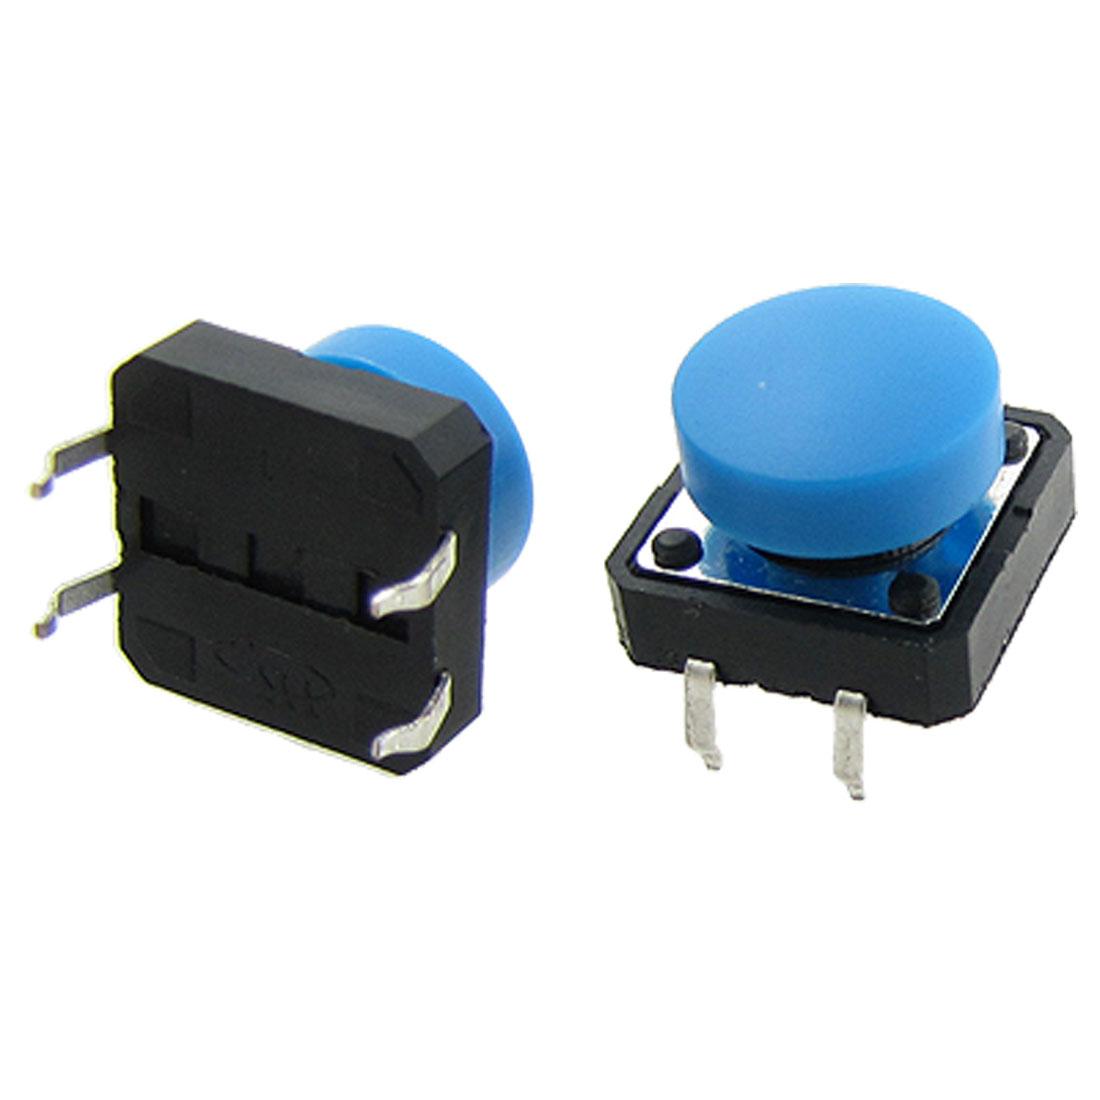 10 Pcs PCB Momentary Tact Tactile Push Button Switch 12x12x12mm 4 Pin DIP + Cap